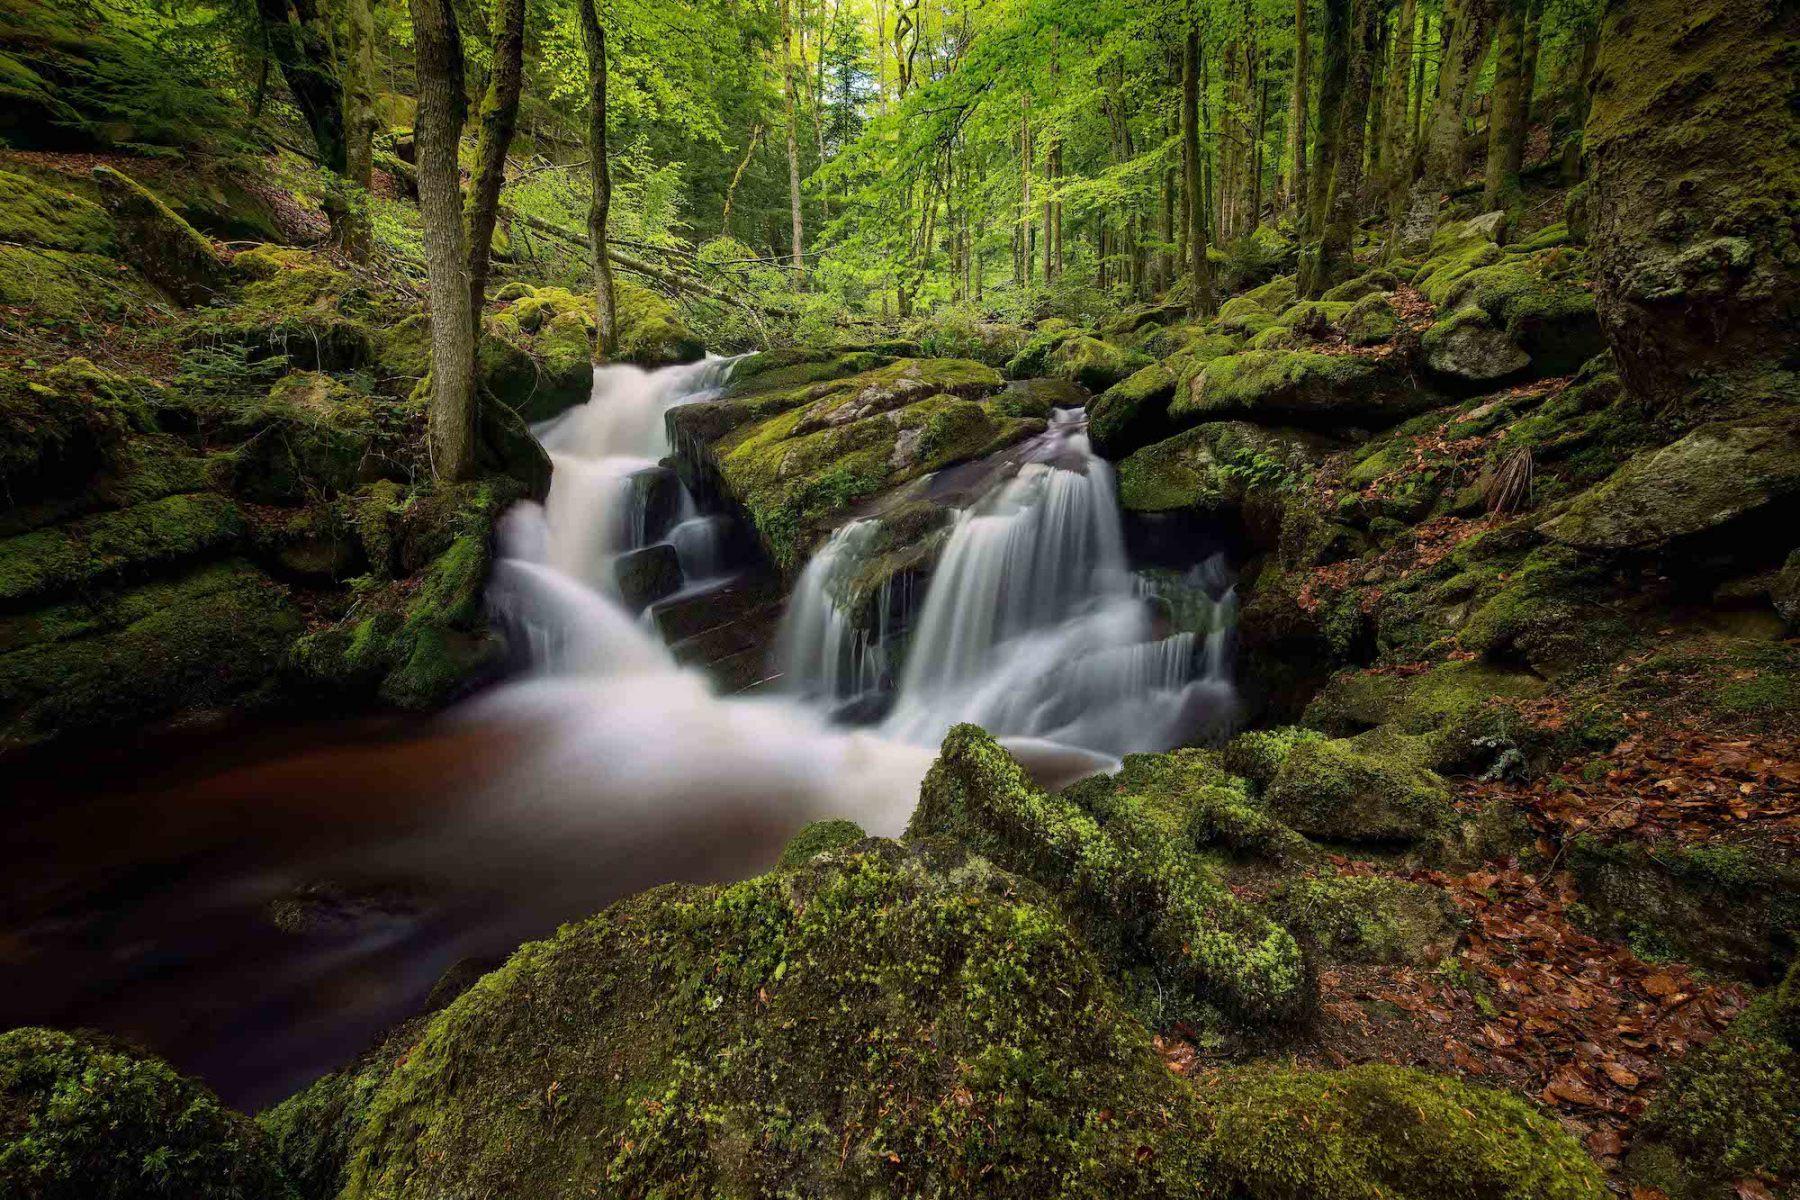 Vallée des Darots - Auvergne - Bougnat Photos